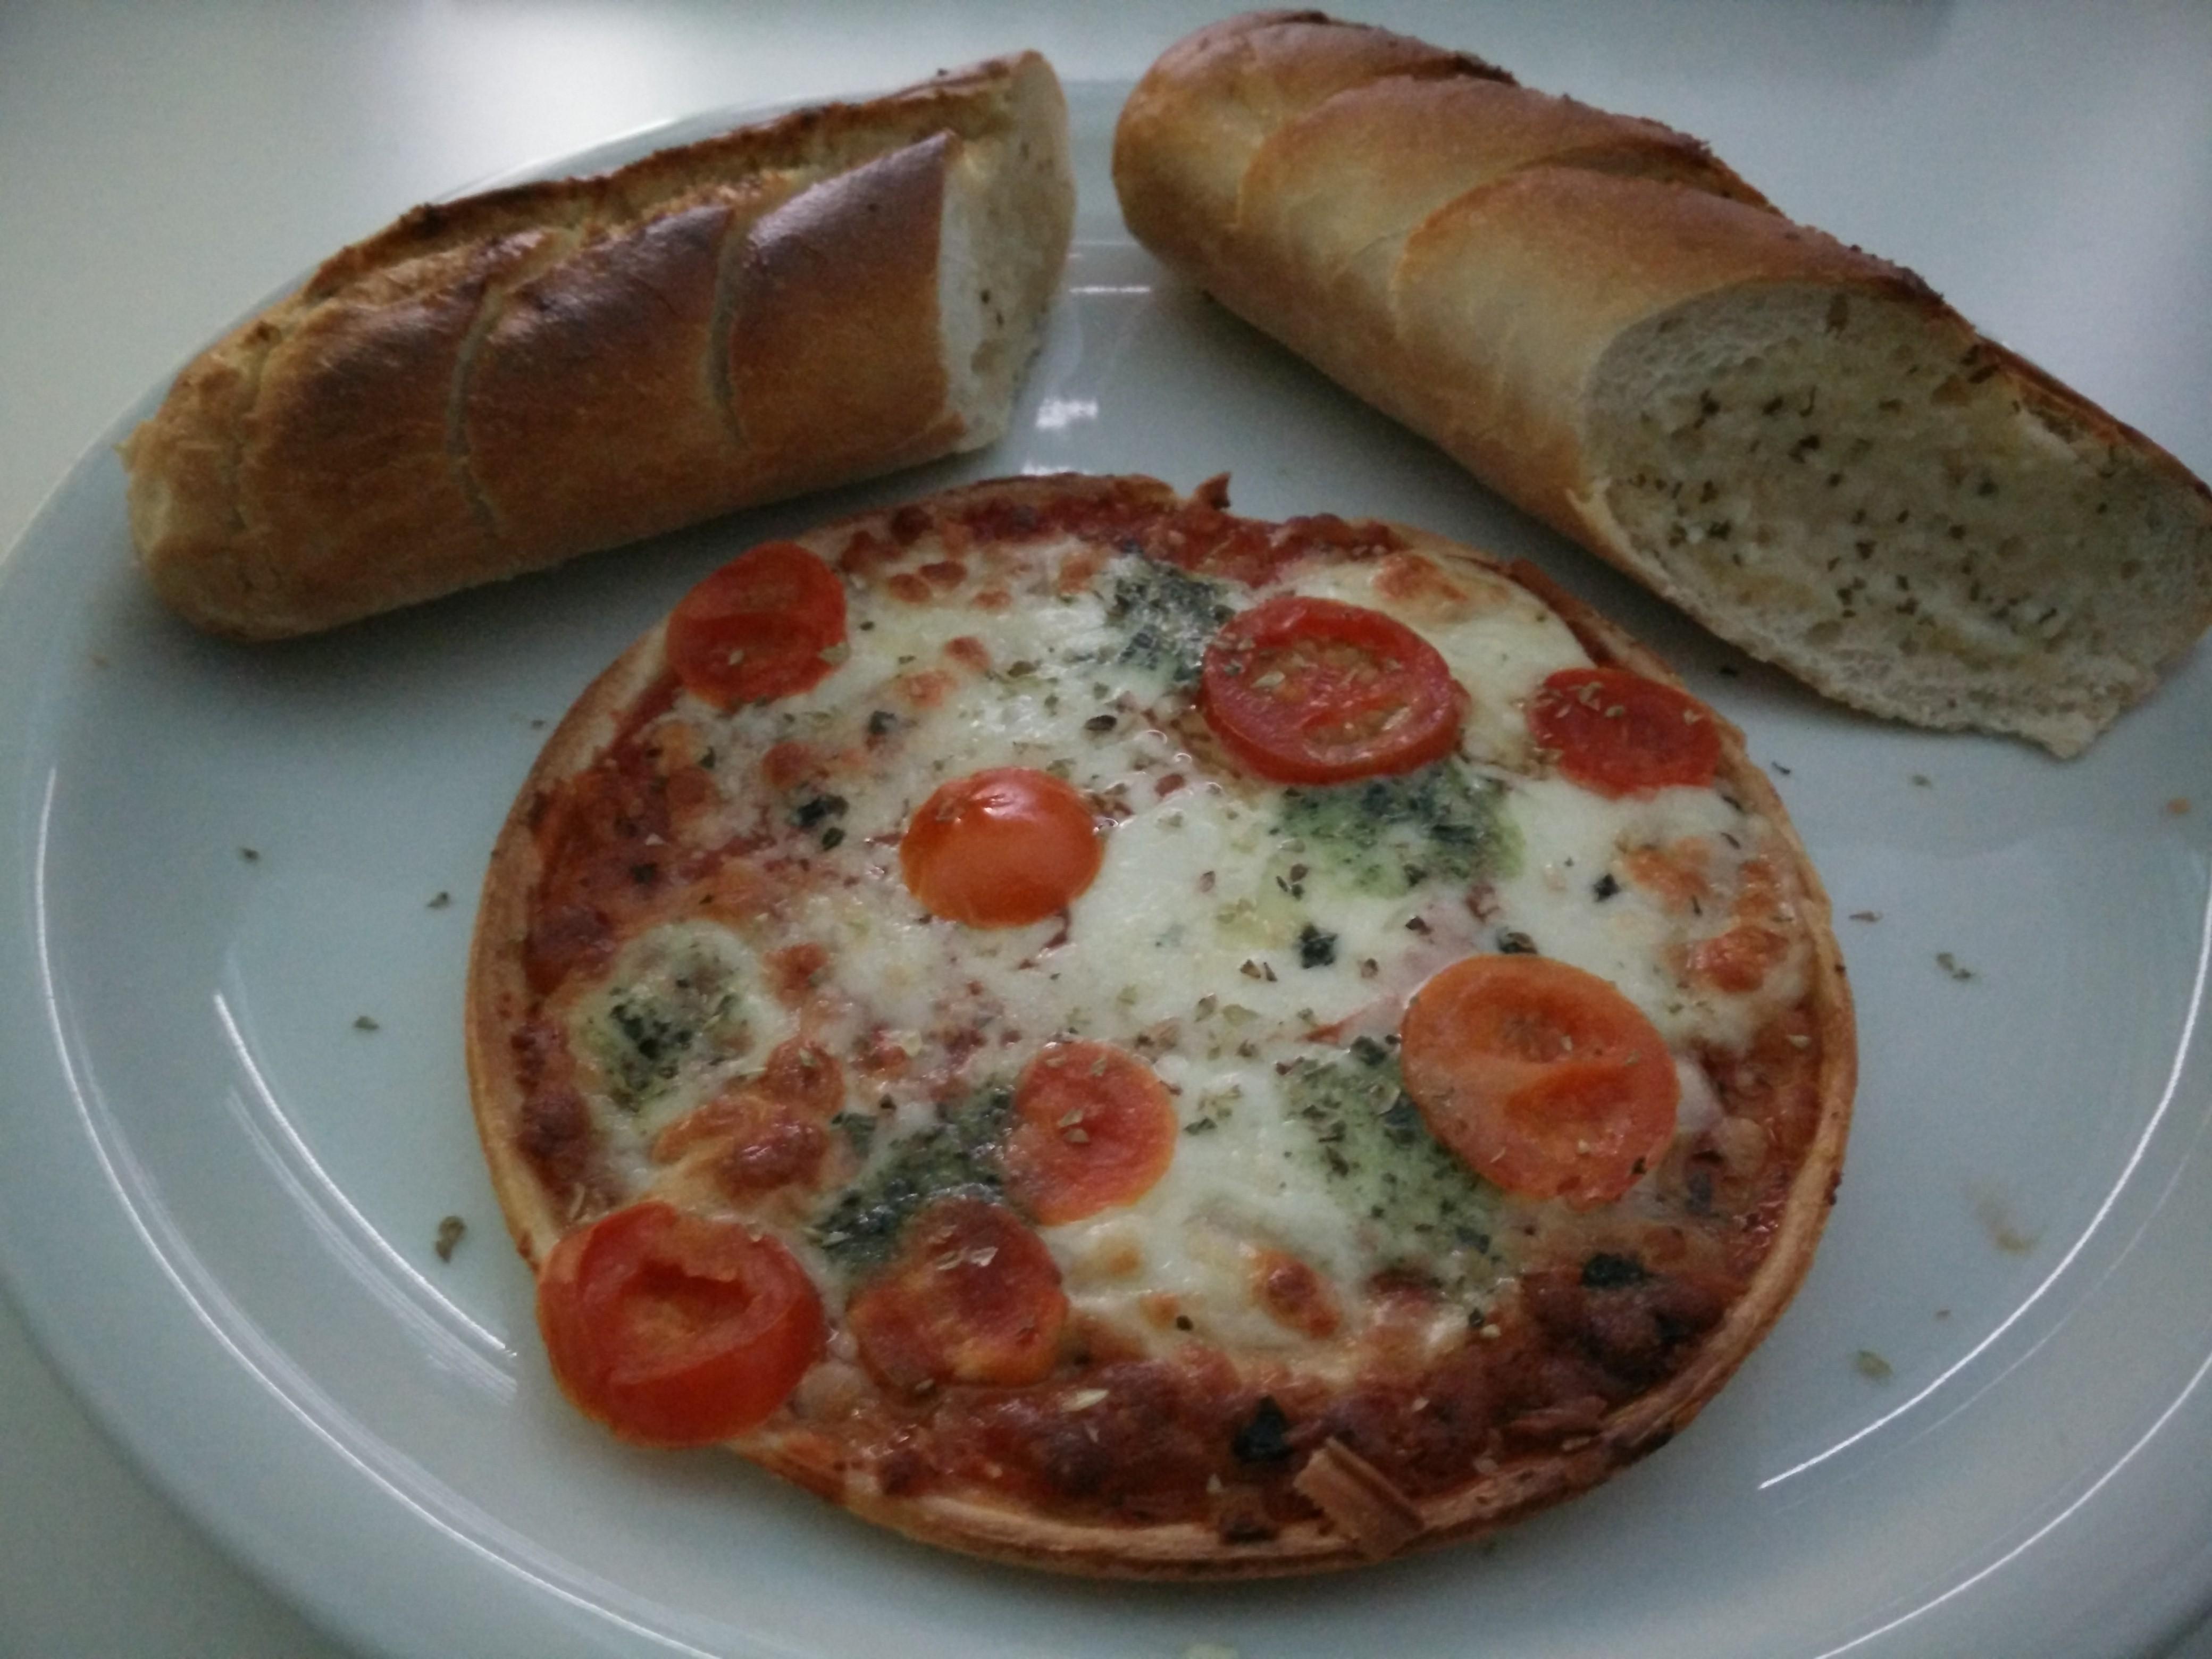 https://foodloader.net/Holz_2016-02-07_Pizza_und_Knoblauchbaguette.jpg